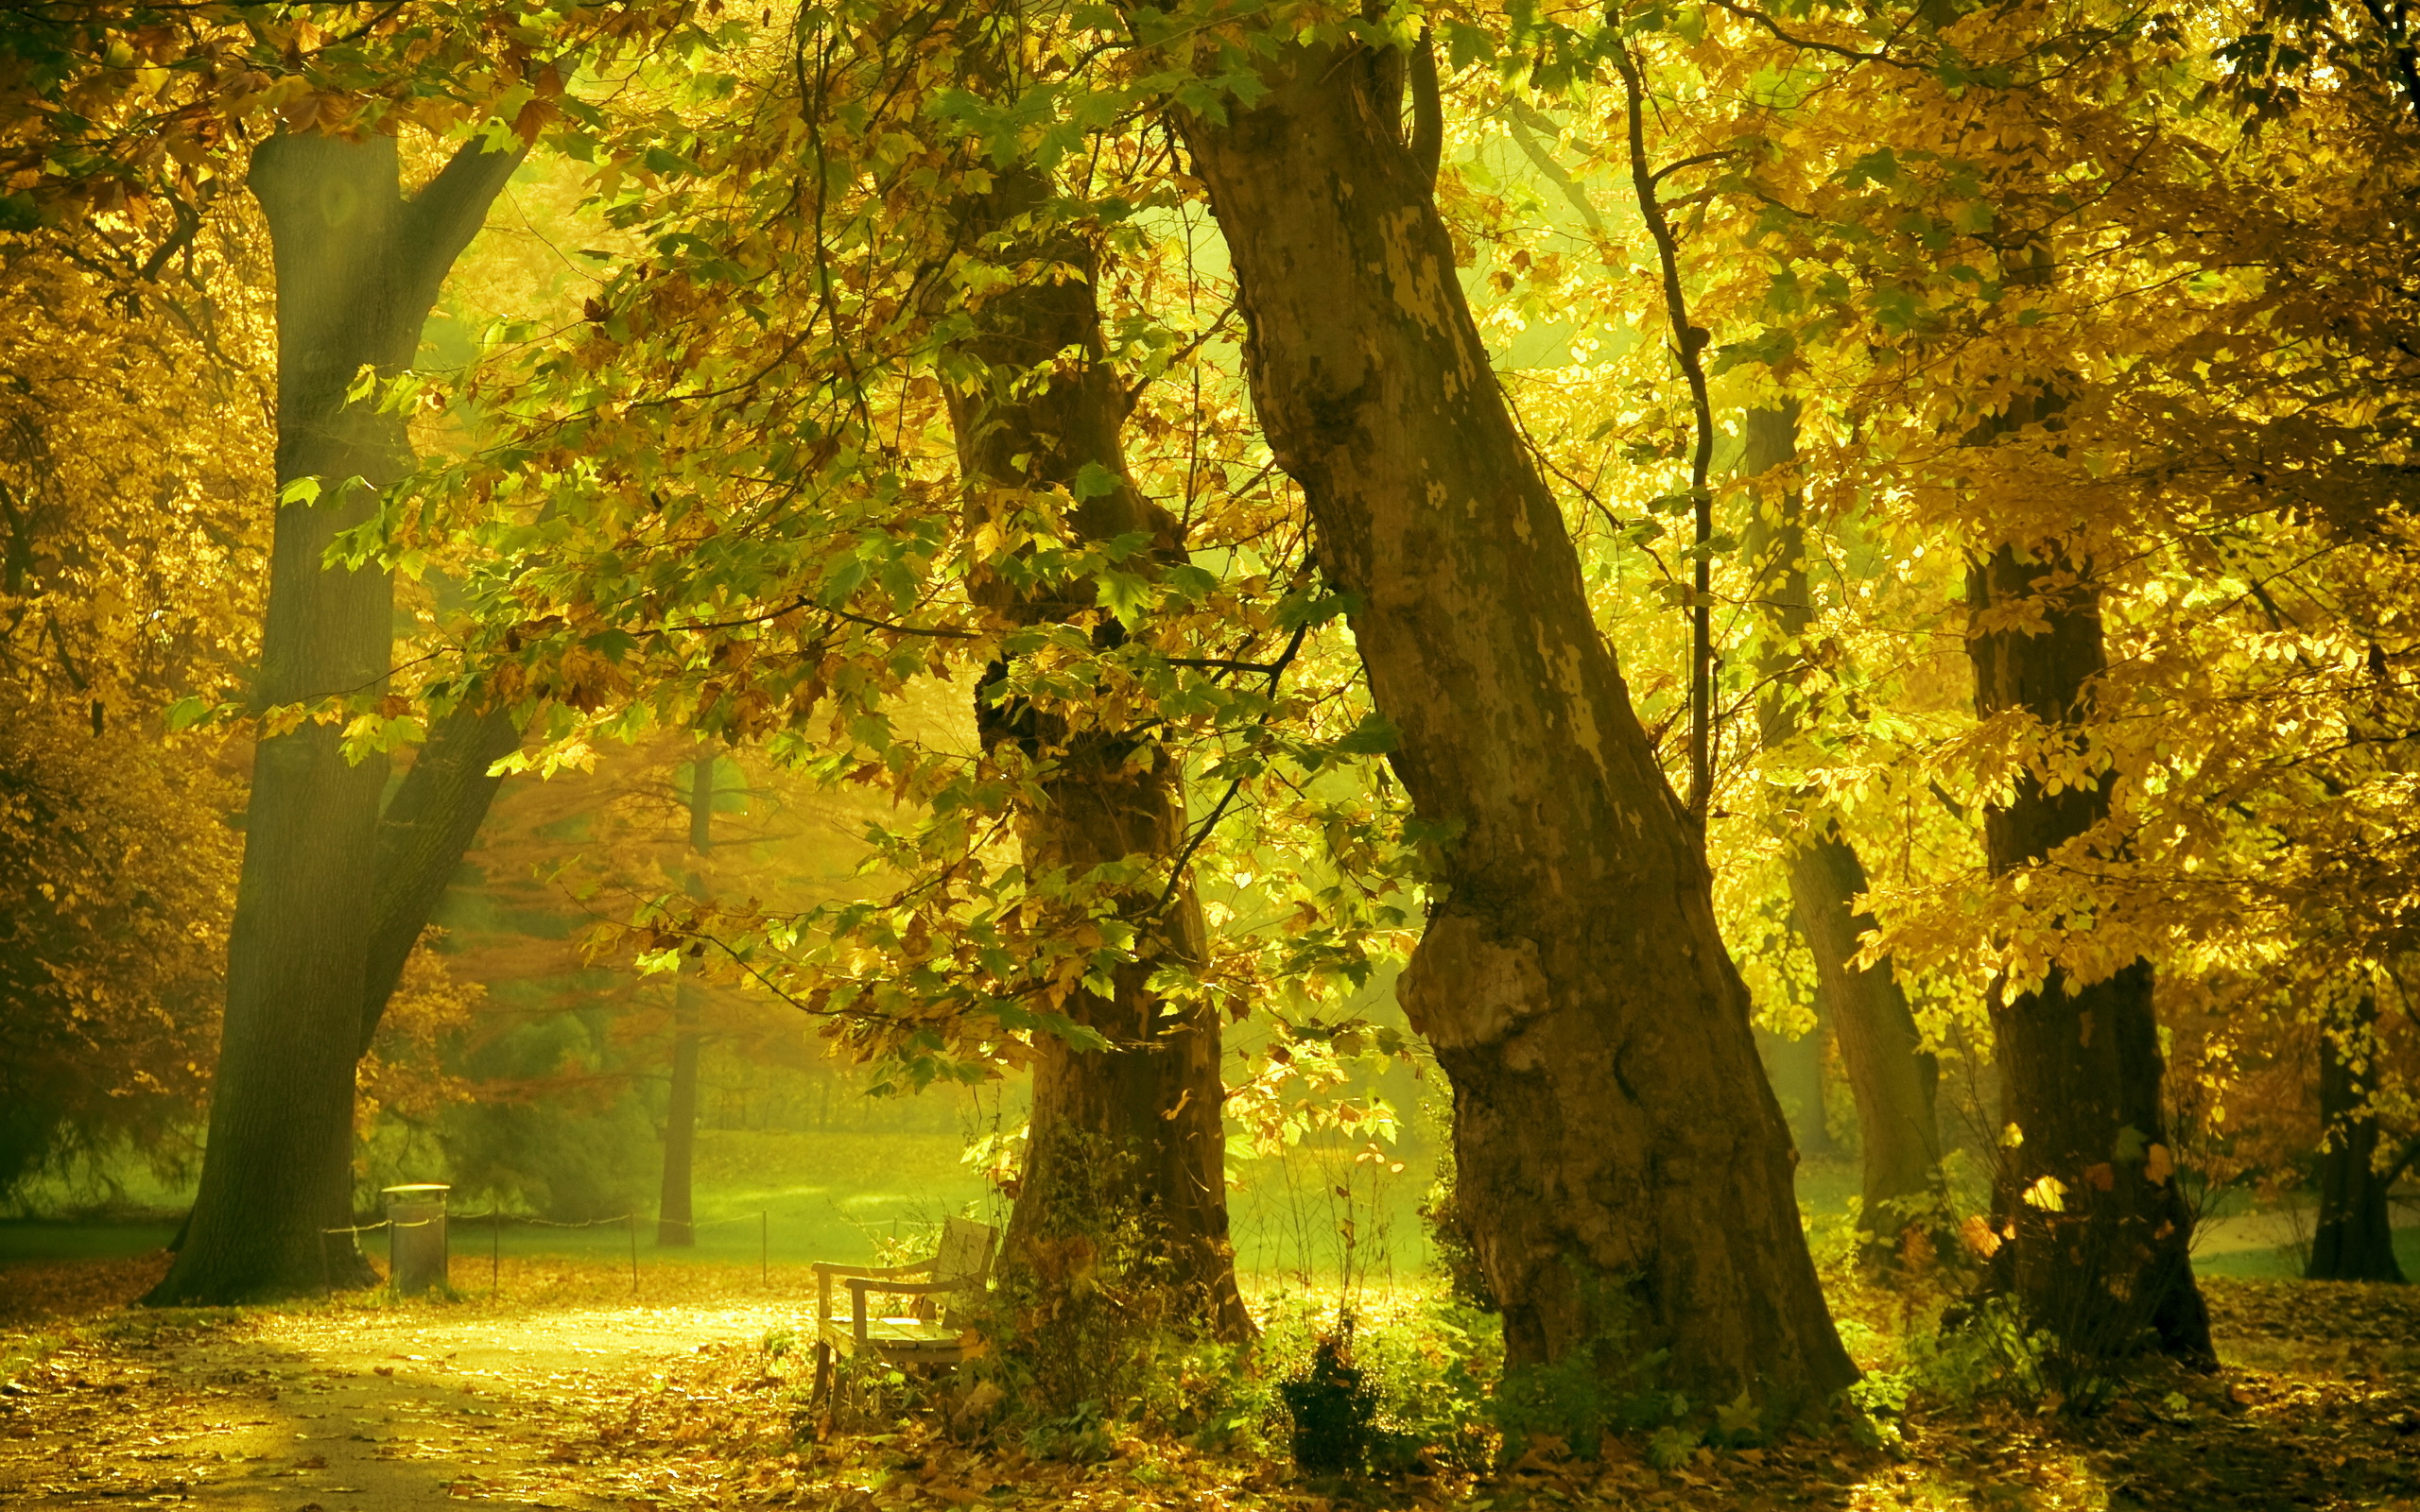 Forest park sunshine